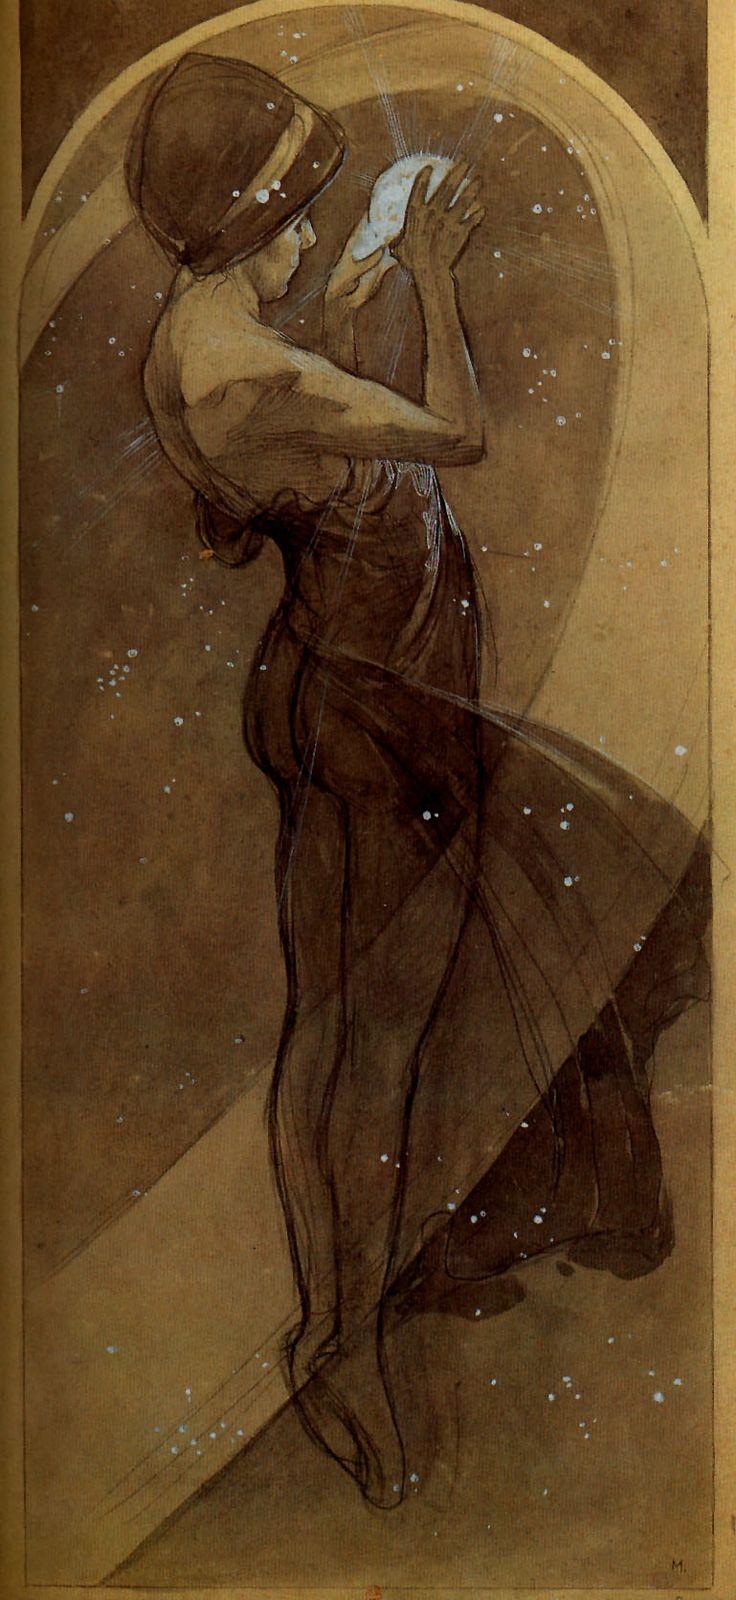 North Star - Alphonse Mucha